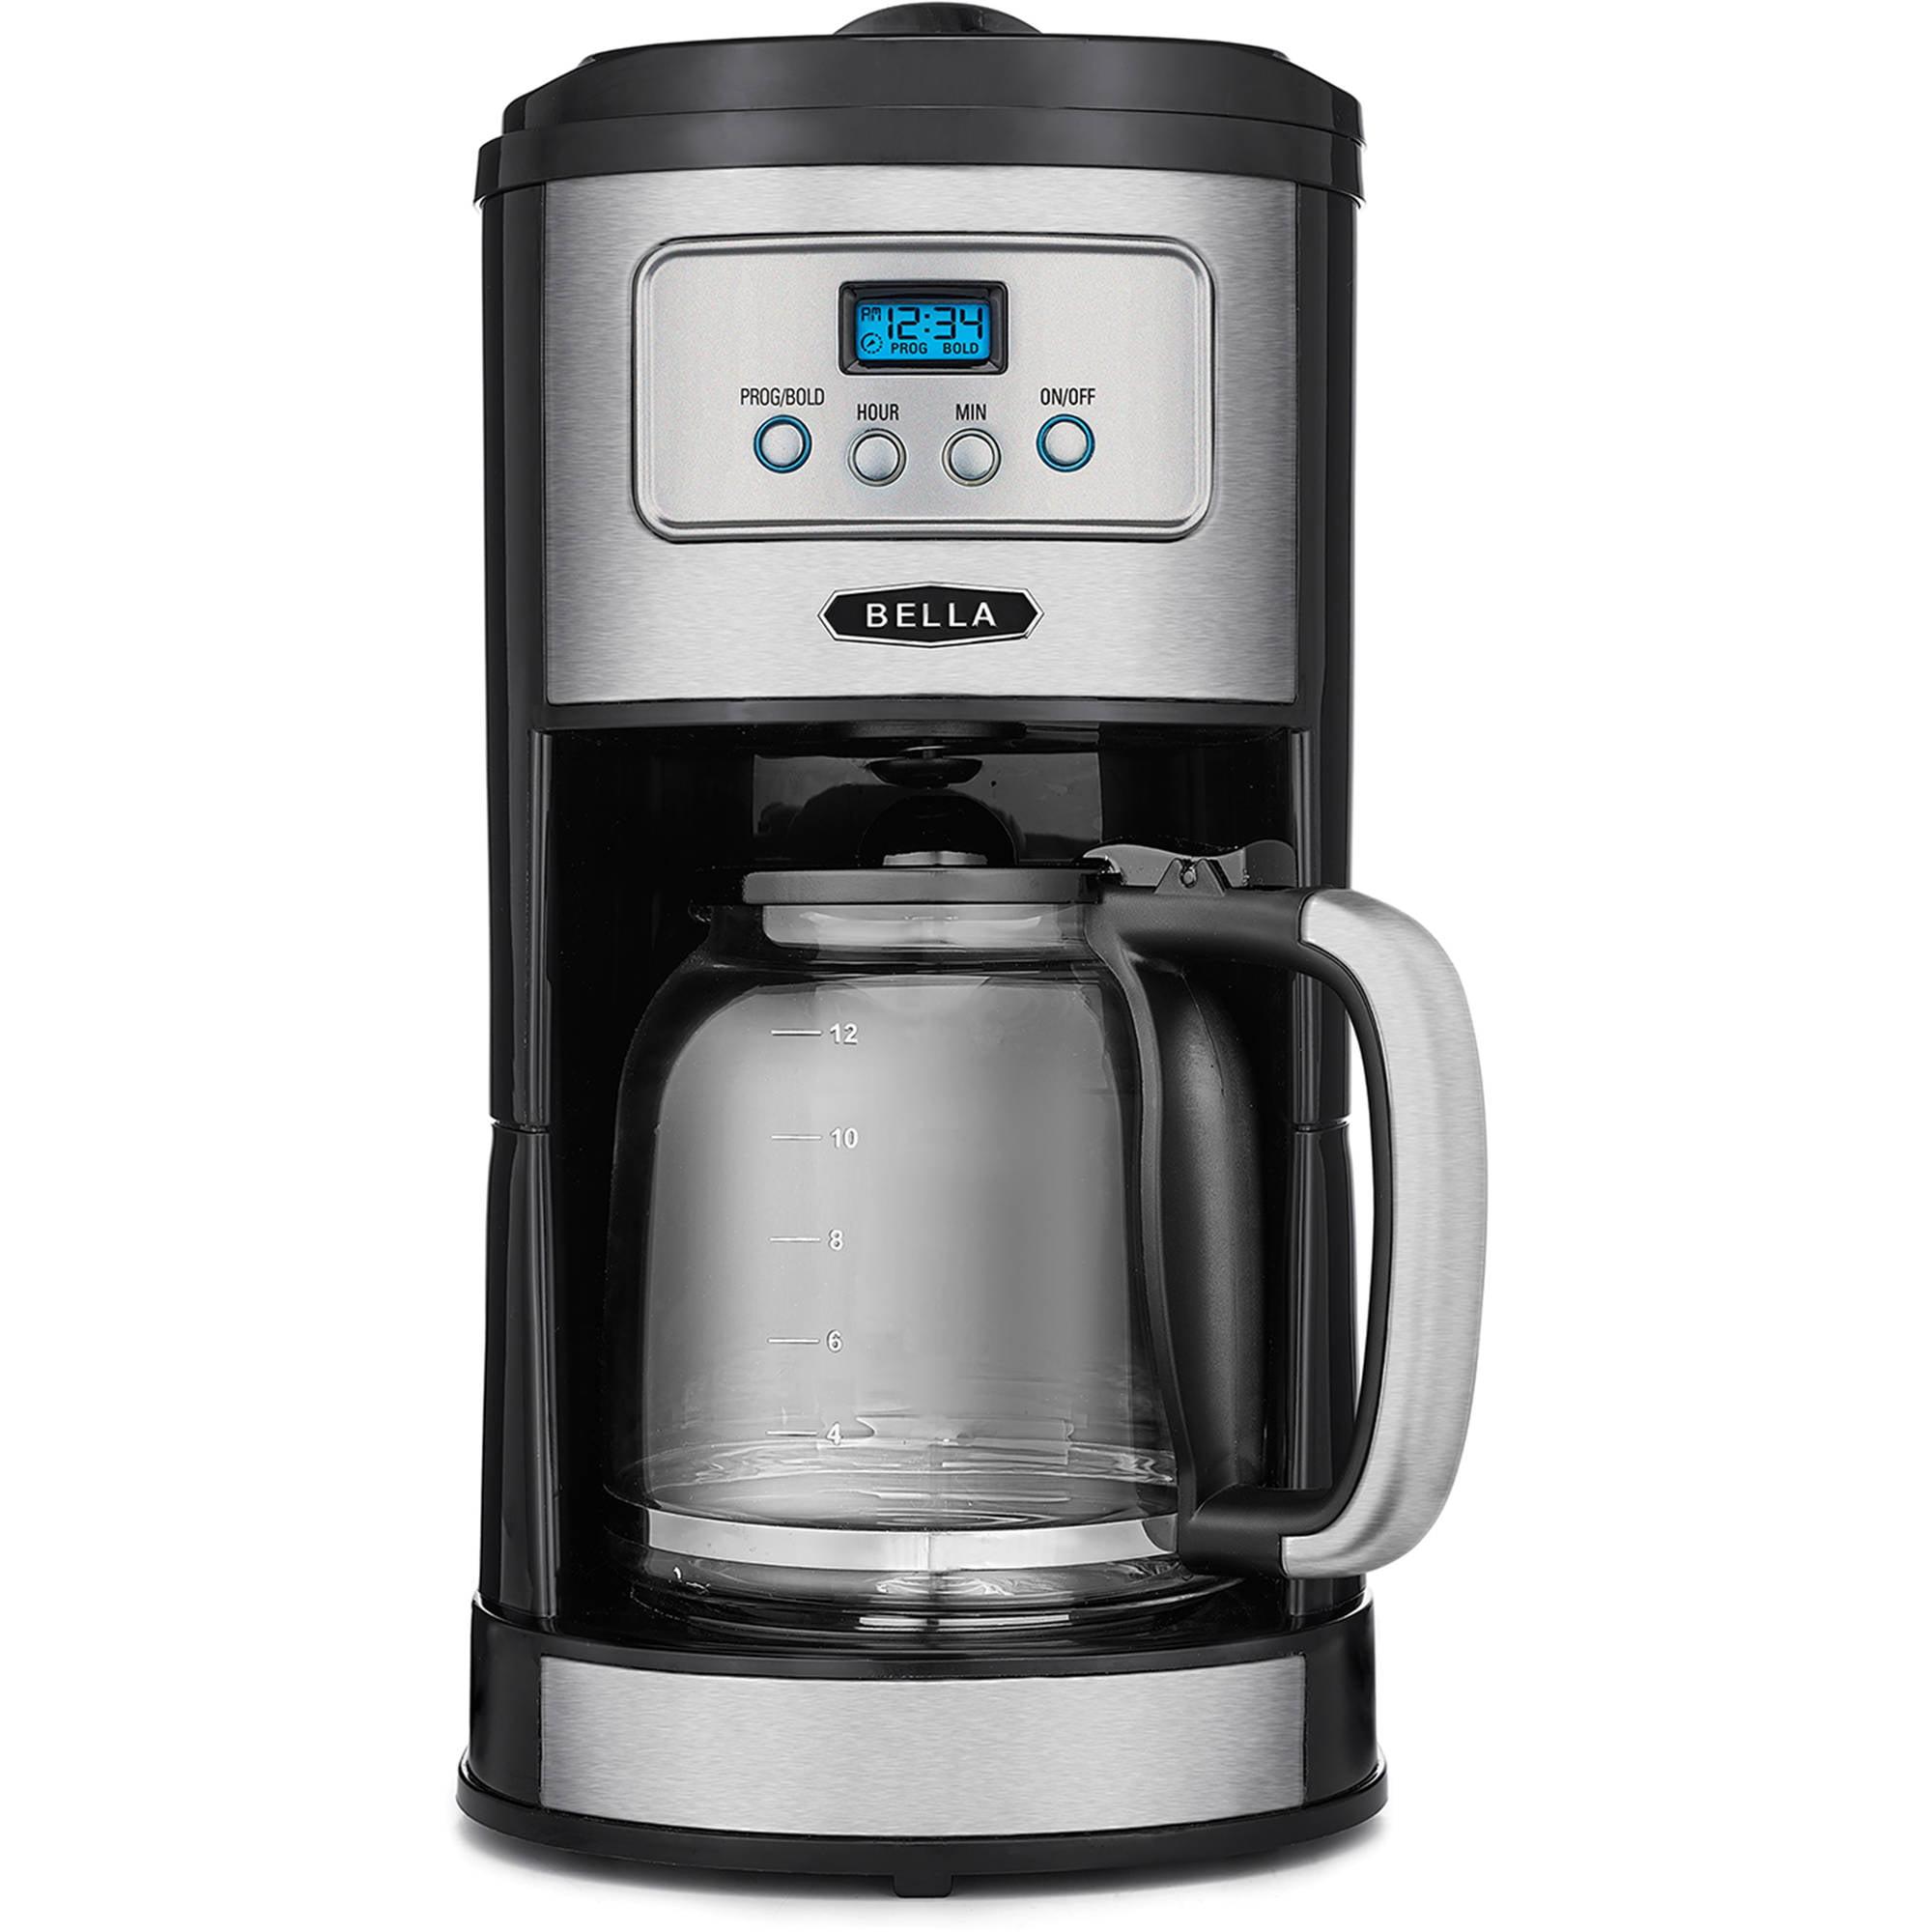 Bella 12-Cup Programmable Coffee Maker